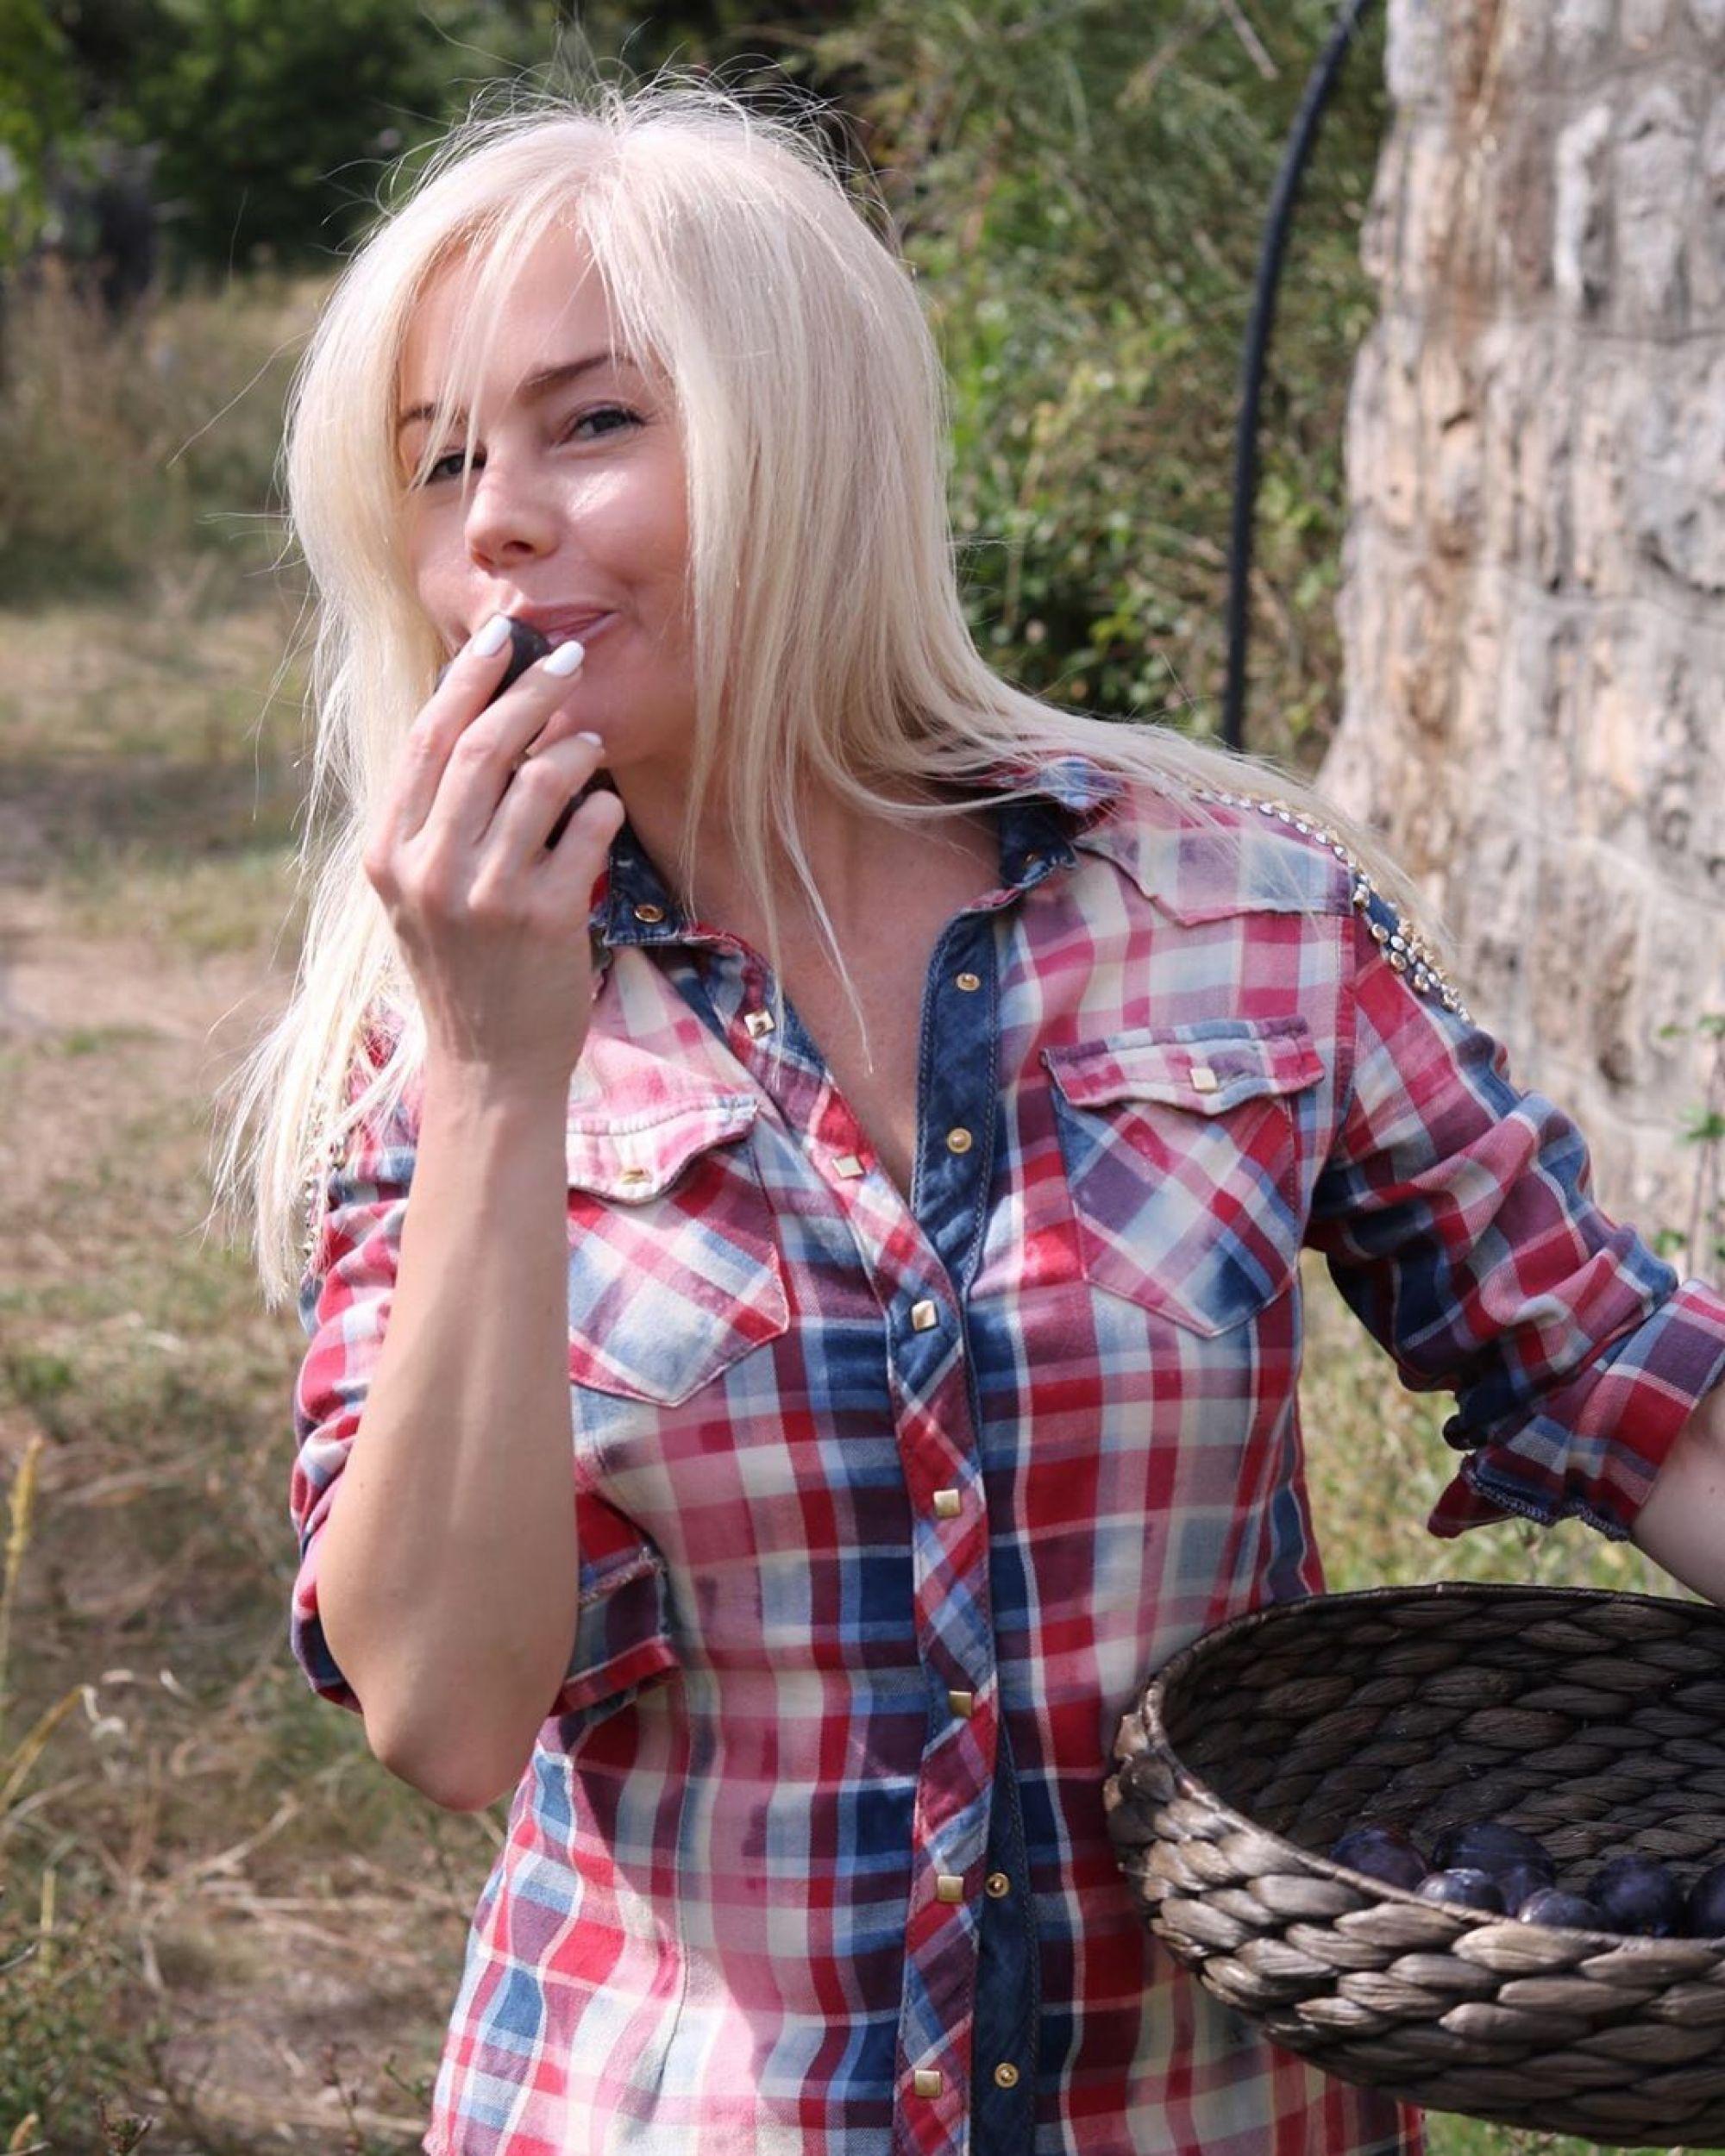 Поклонники раскритиковали Елену Корикову за опухшее лицо